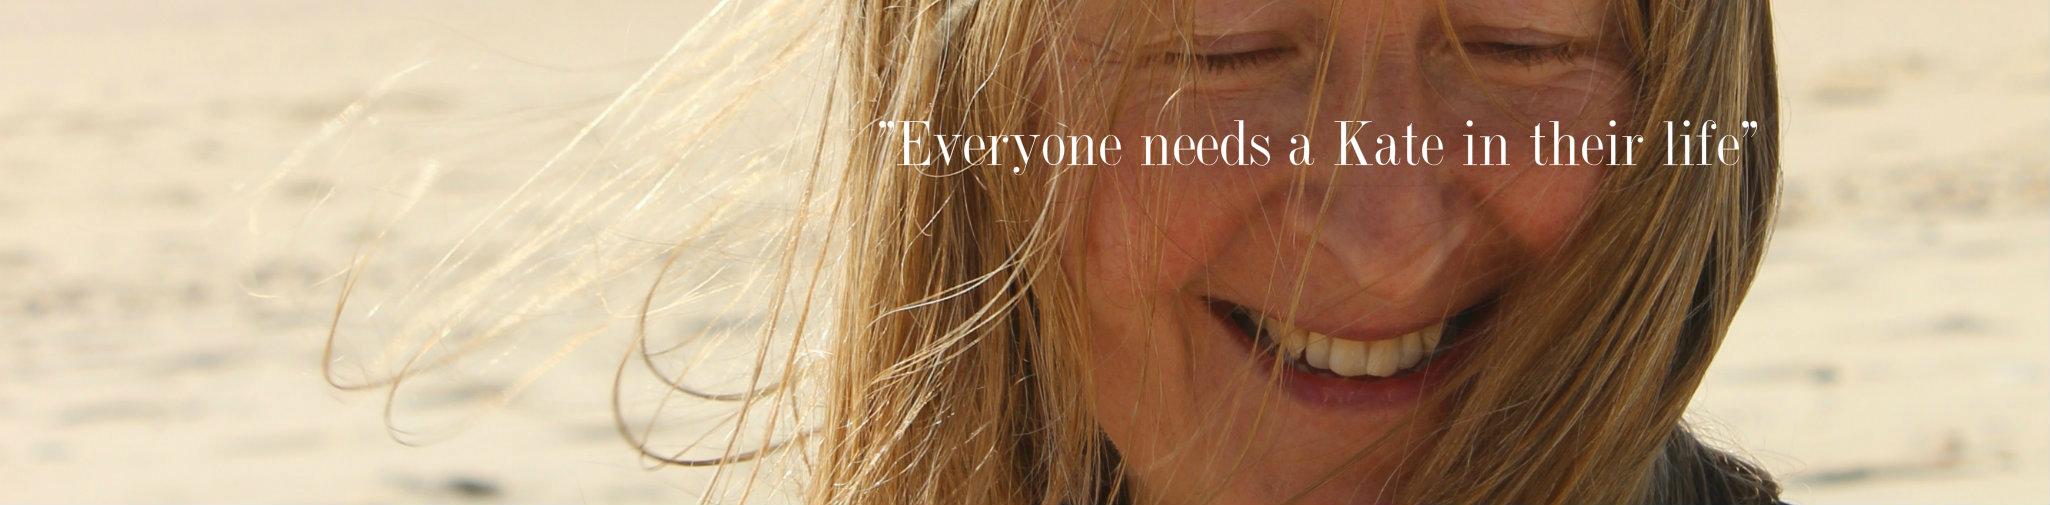 Everyone needs new.jpg